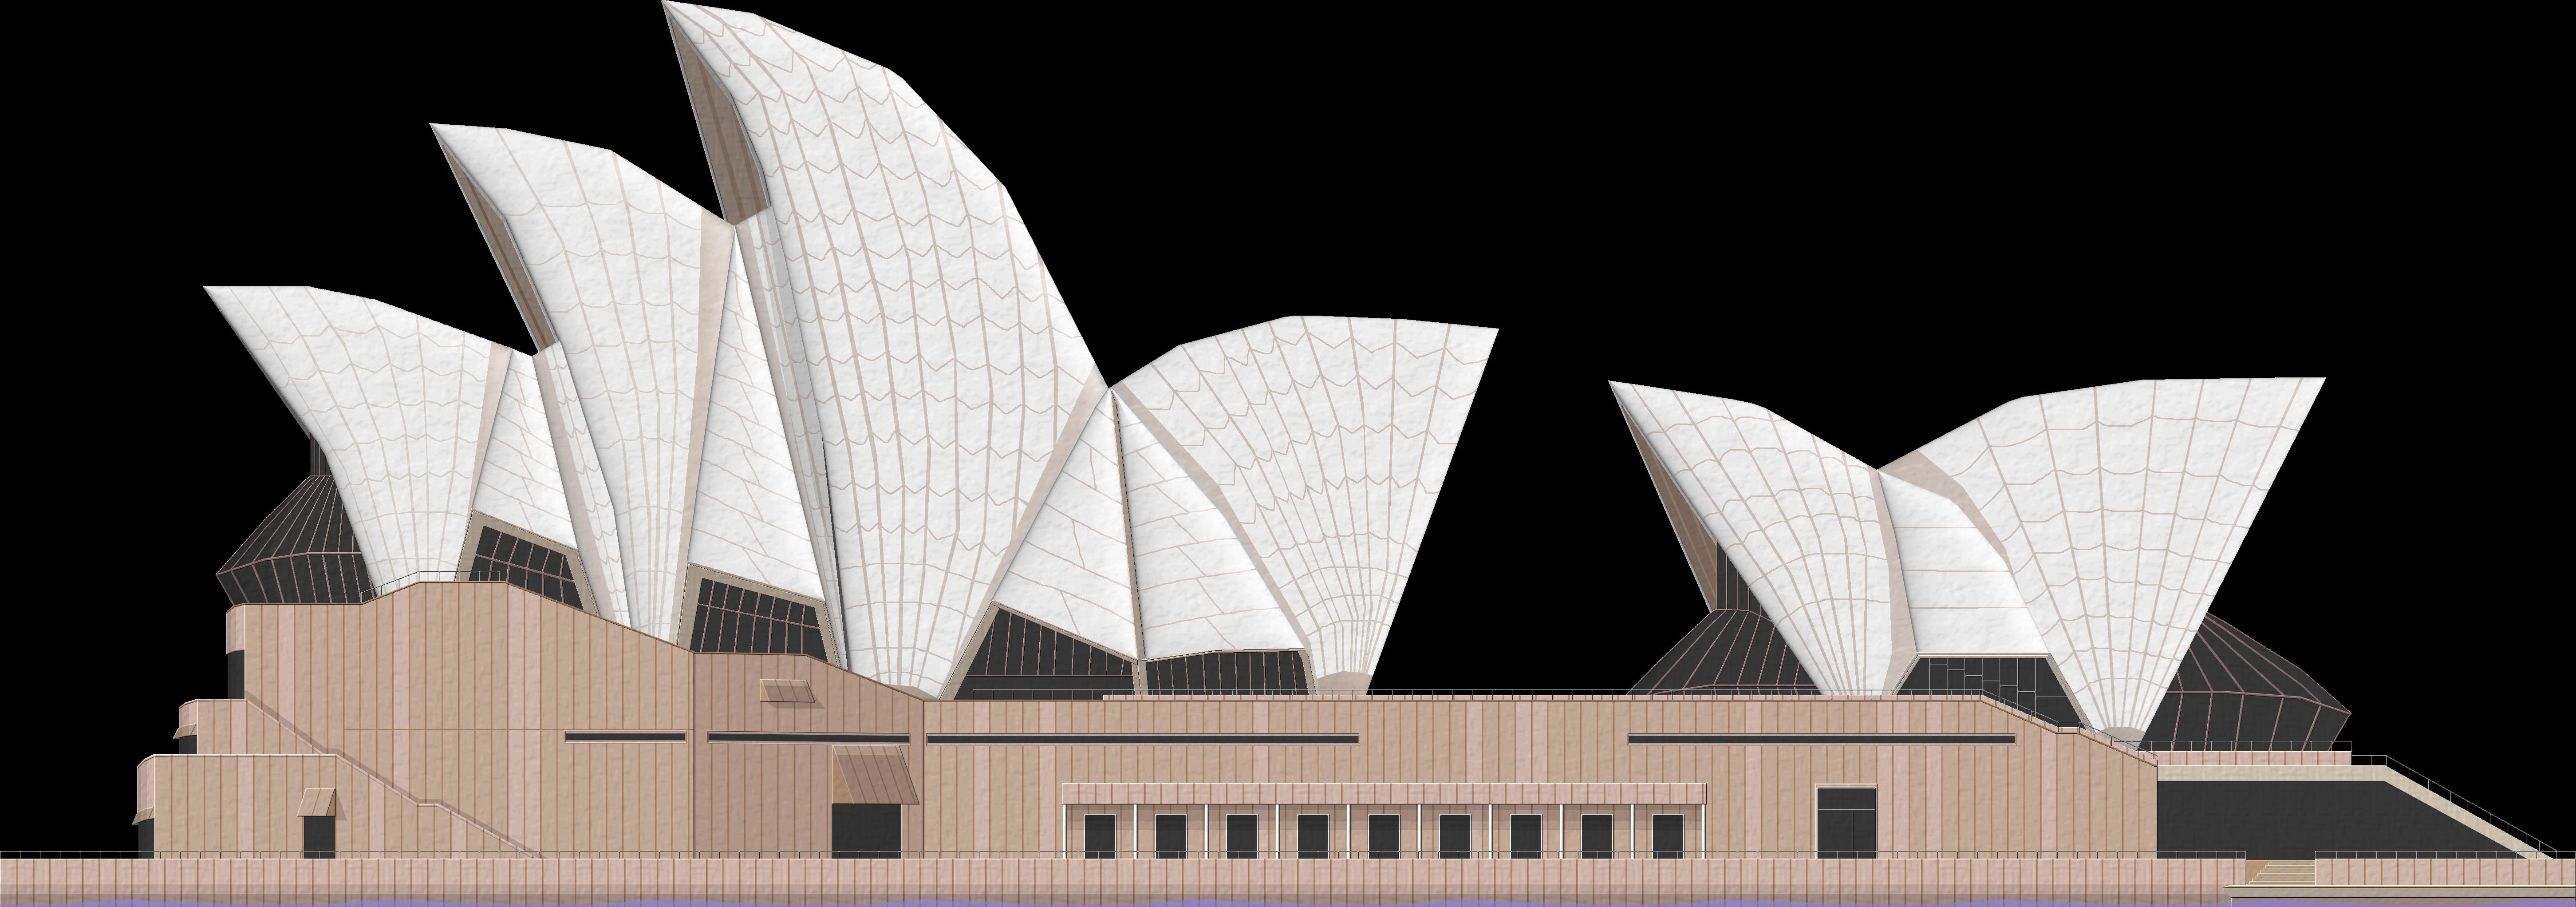 sydney opera house by herbertrocha on deviantart